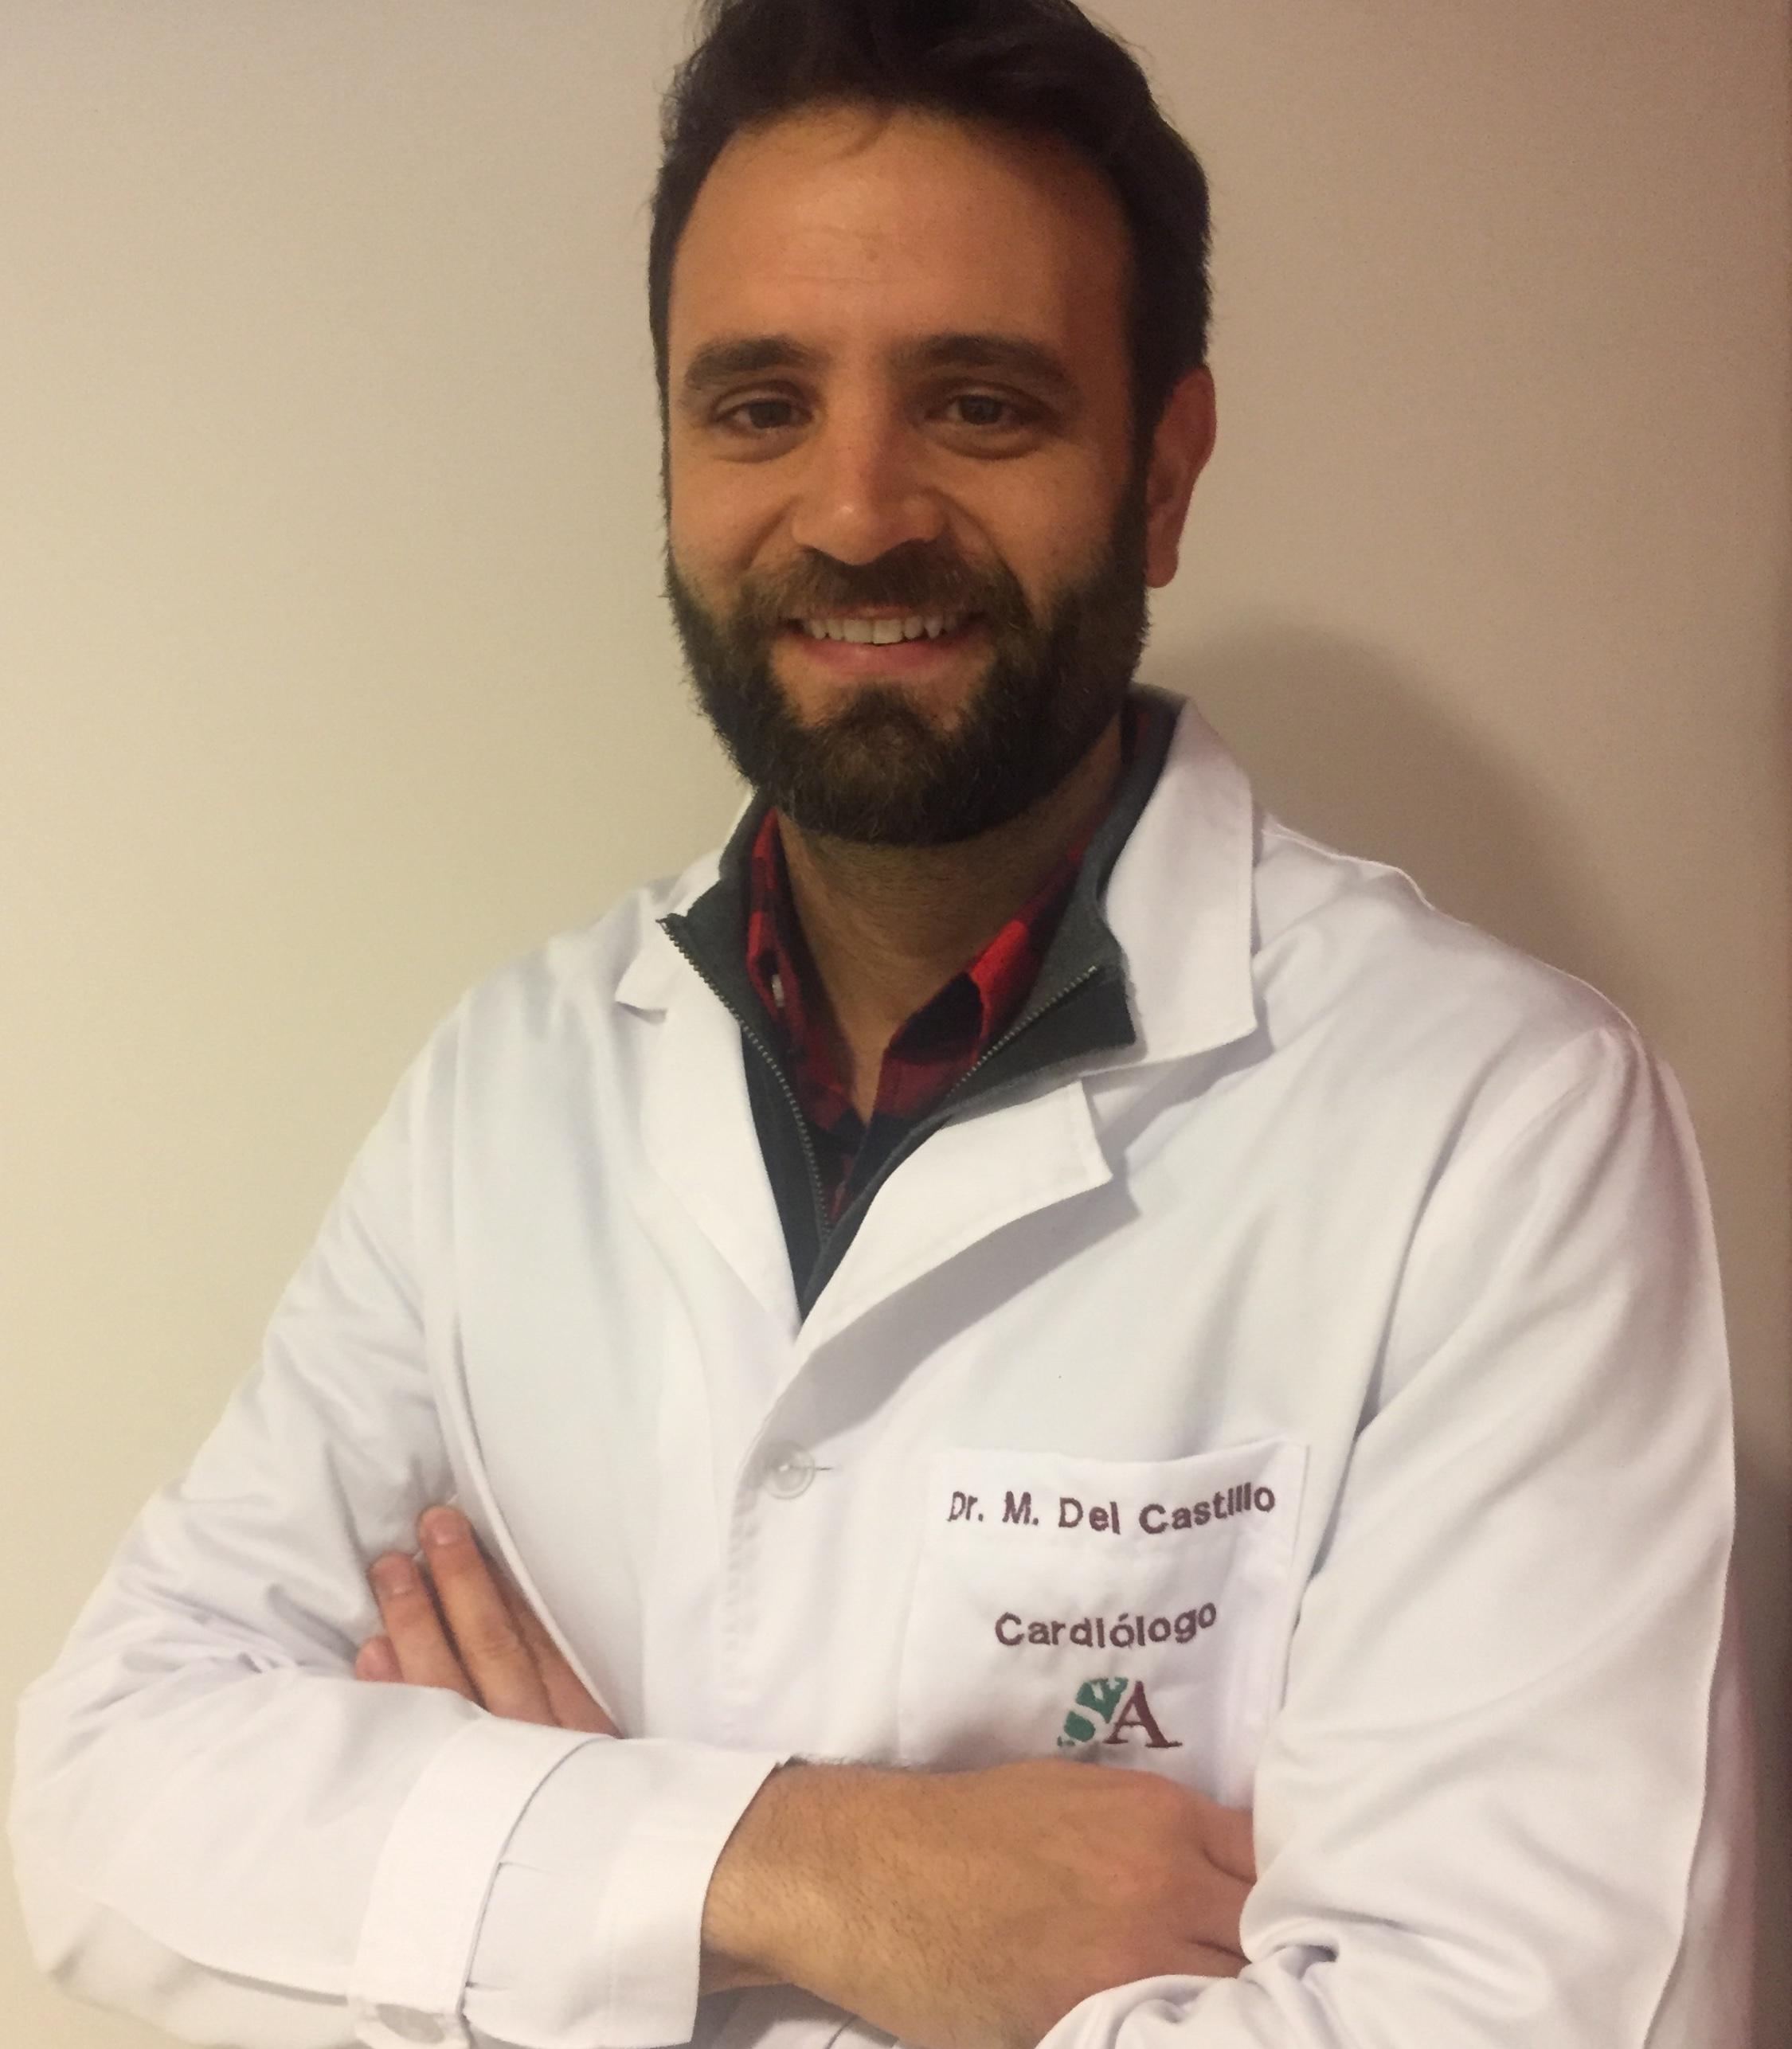 Dr. Del castillo Martin